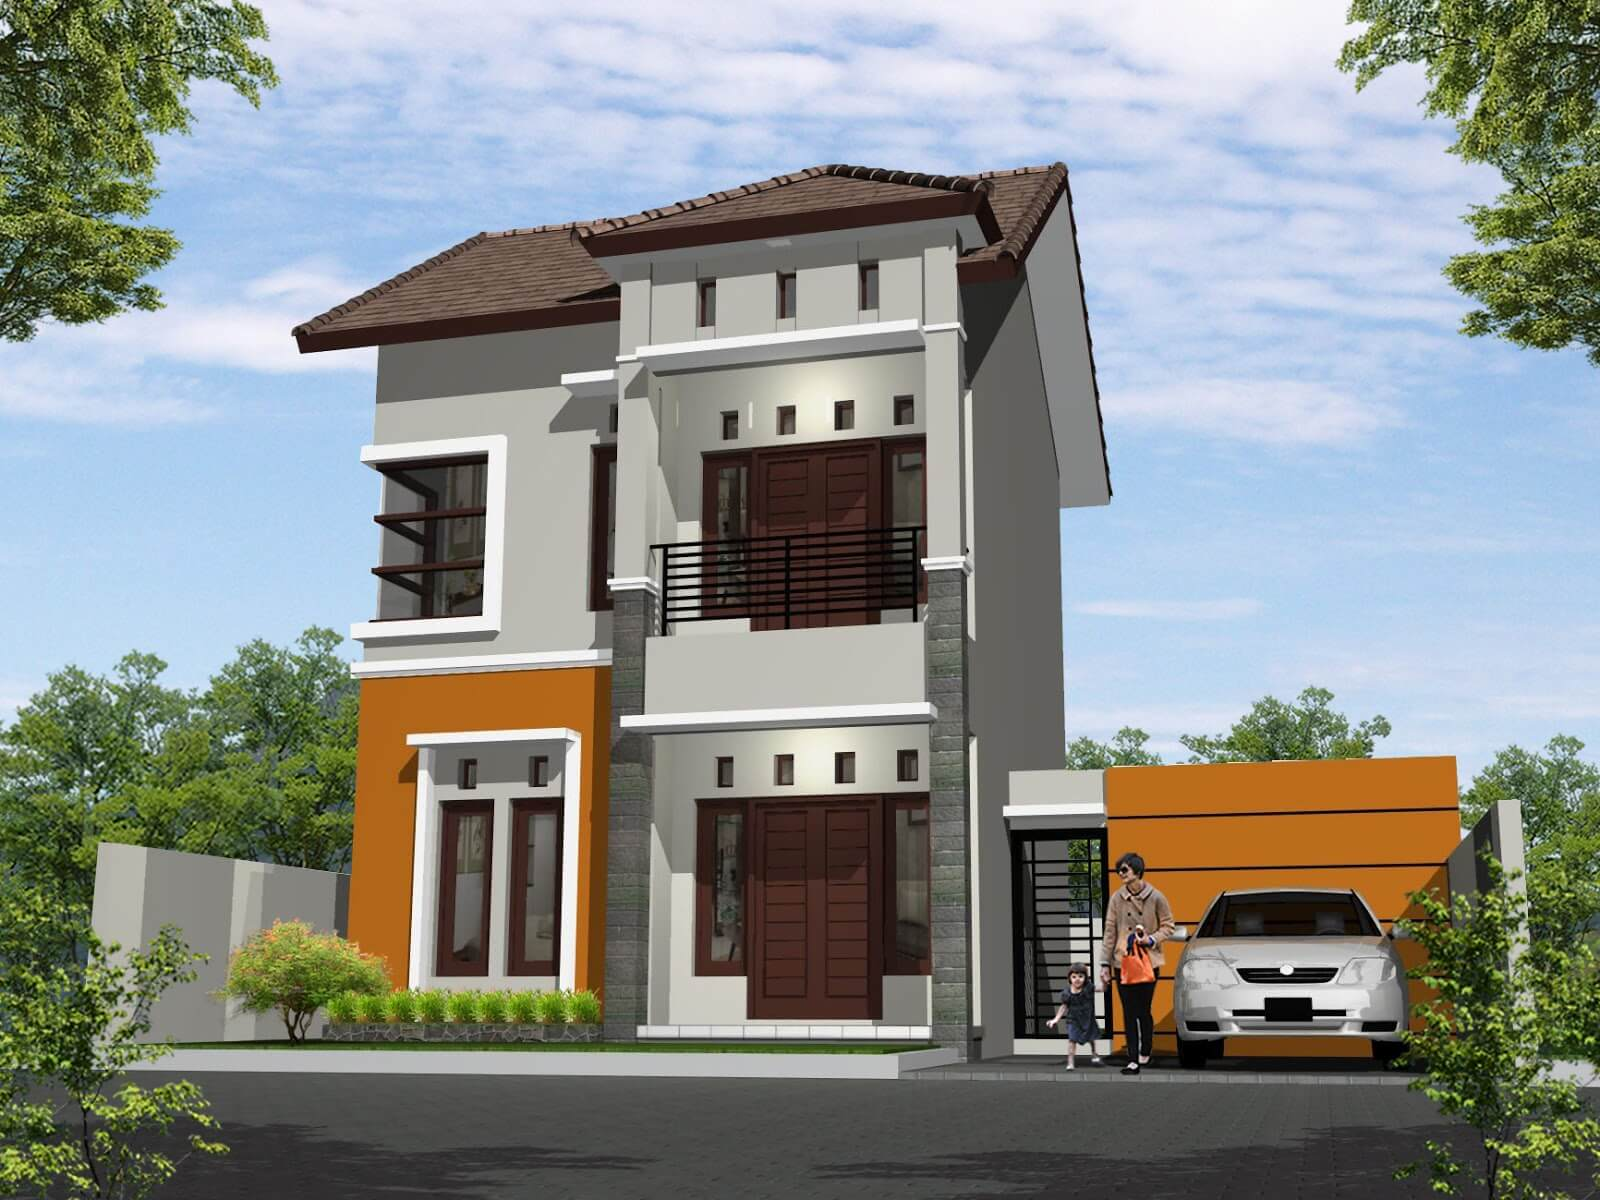 Desain Rumah Minimalis 2 Lantai tanpa Pagar